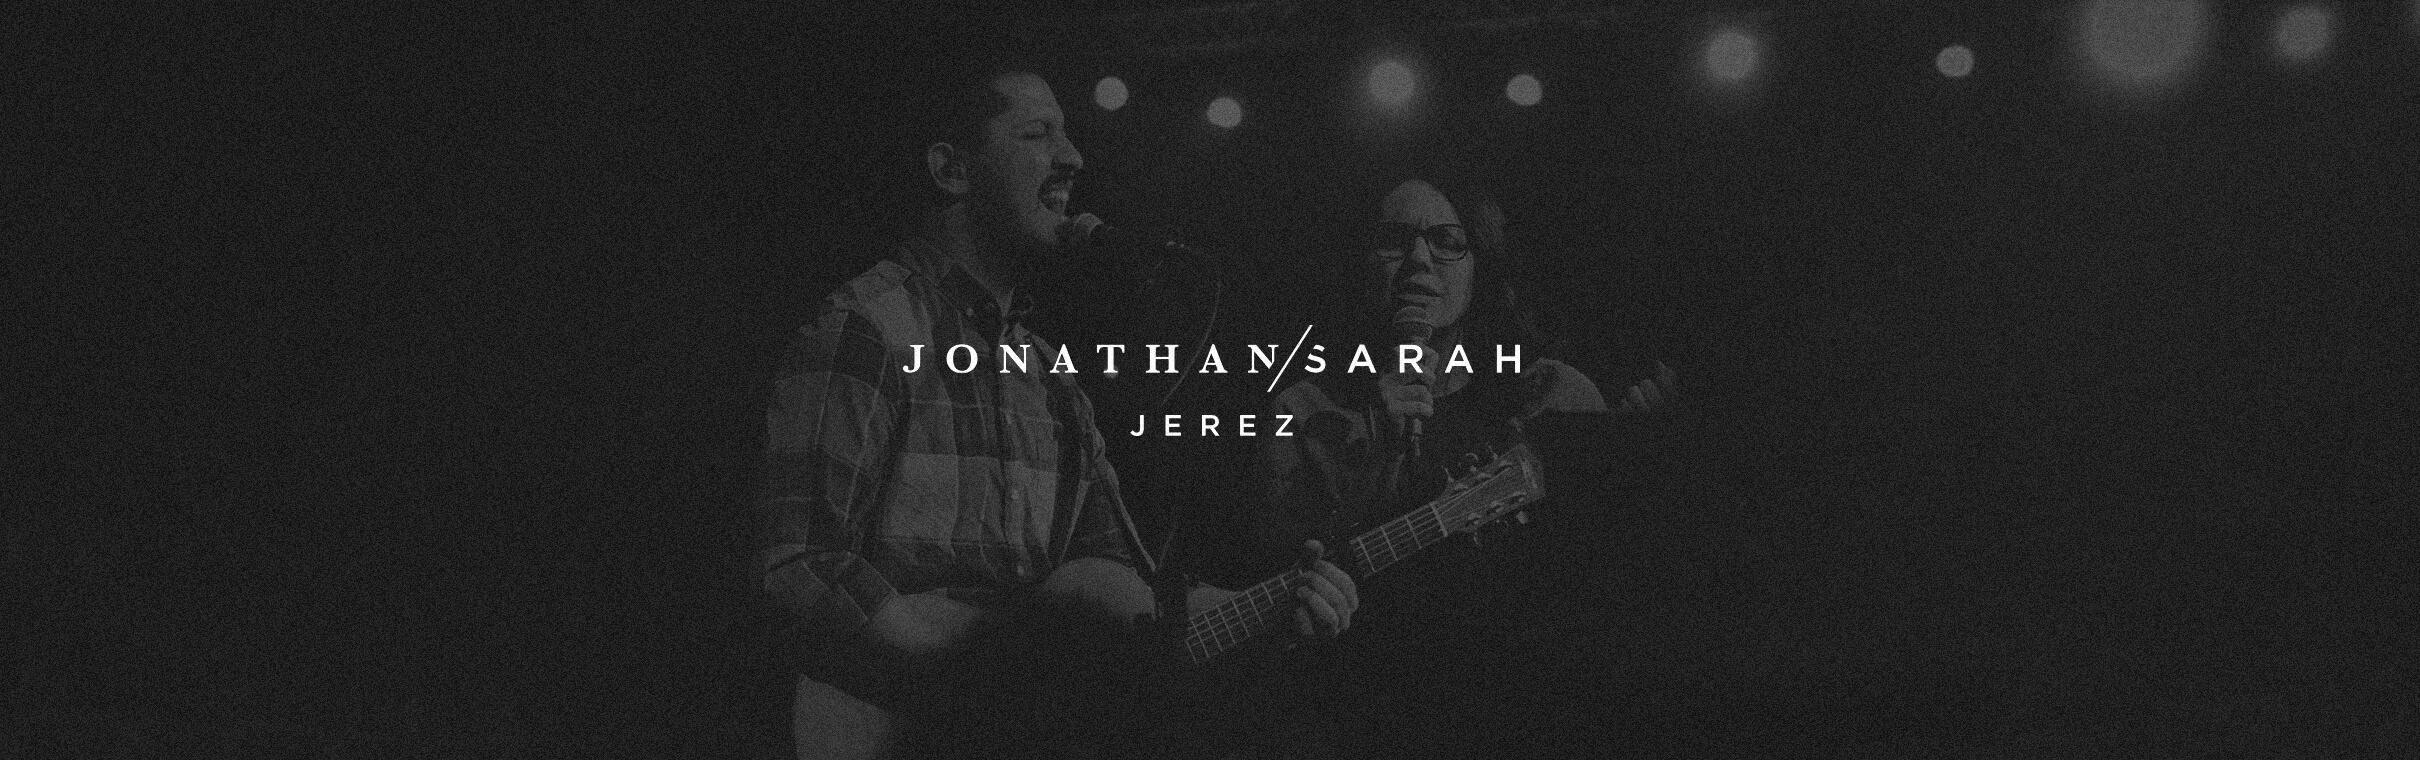 Jonathan y Sarah Jerez